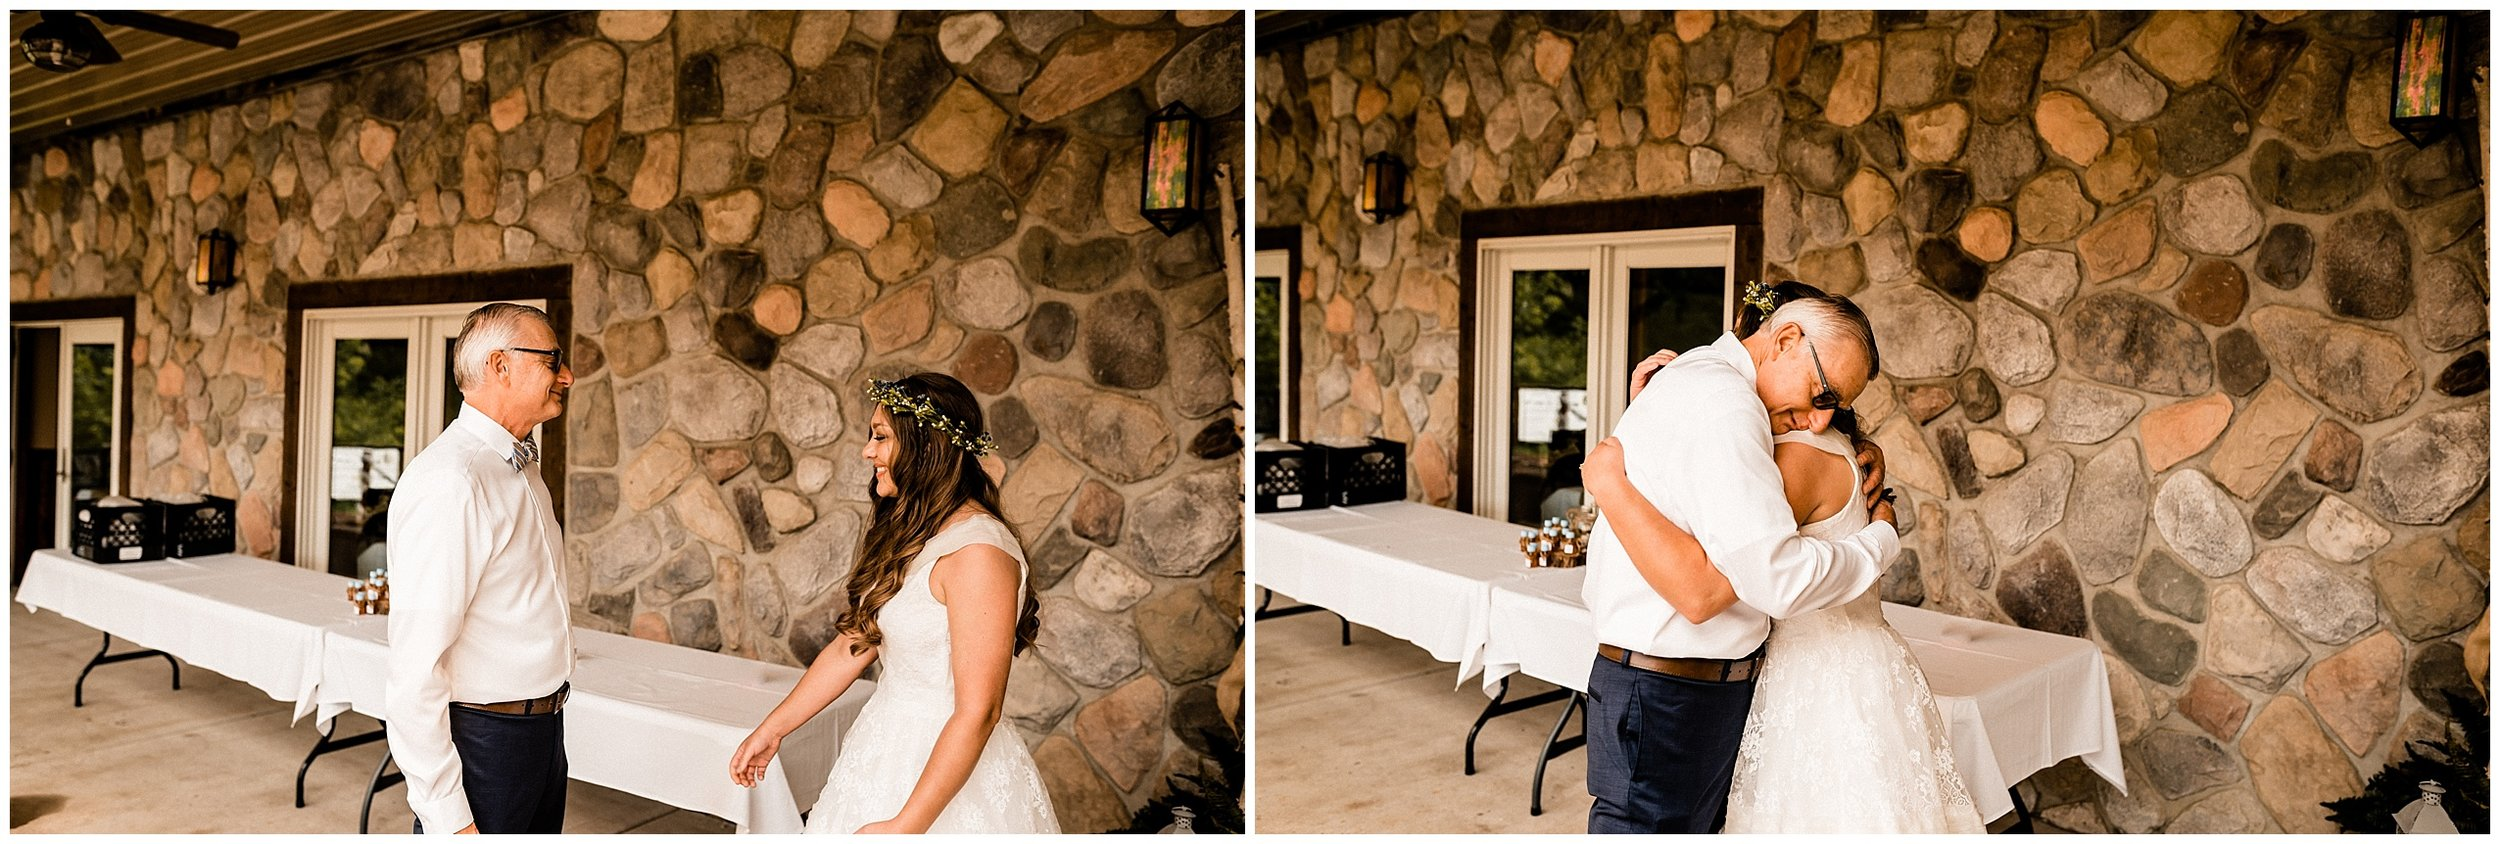 Jerod + Ashley | Just Married #kyleepaigephotography_1778.jpg